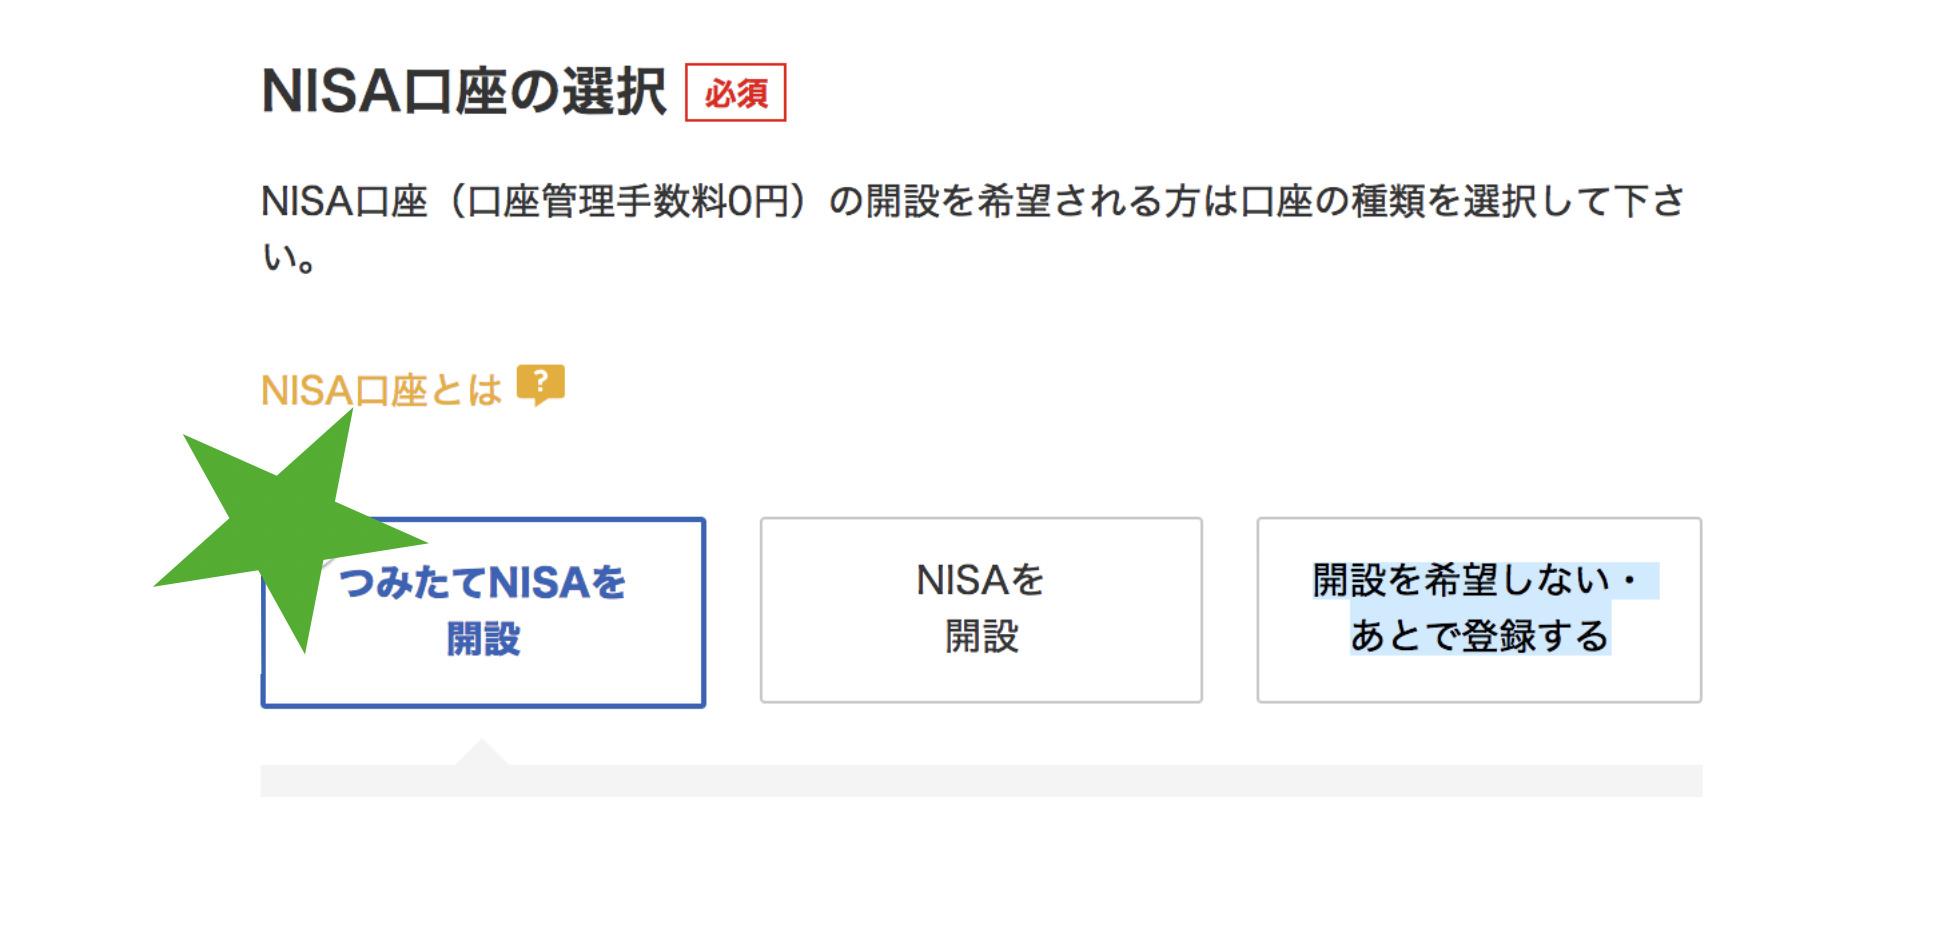 楽天証券 NISA